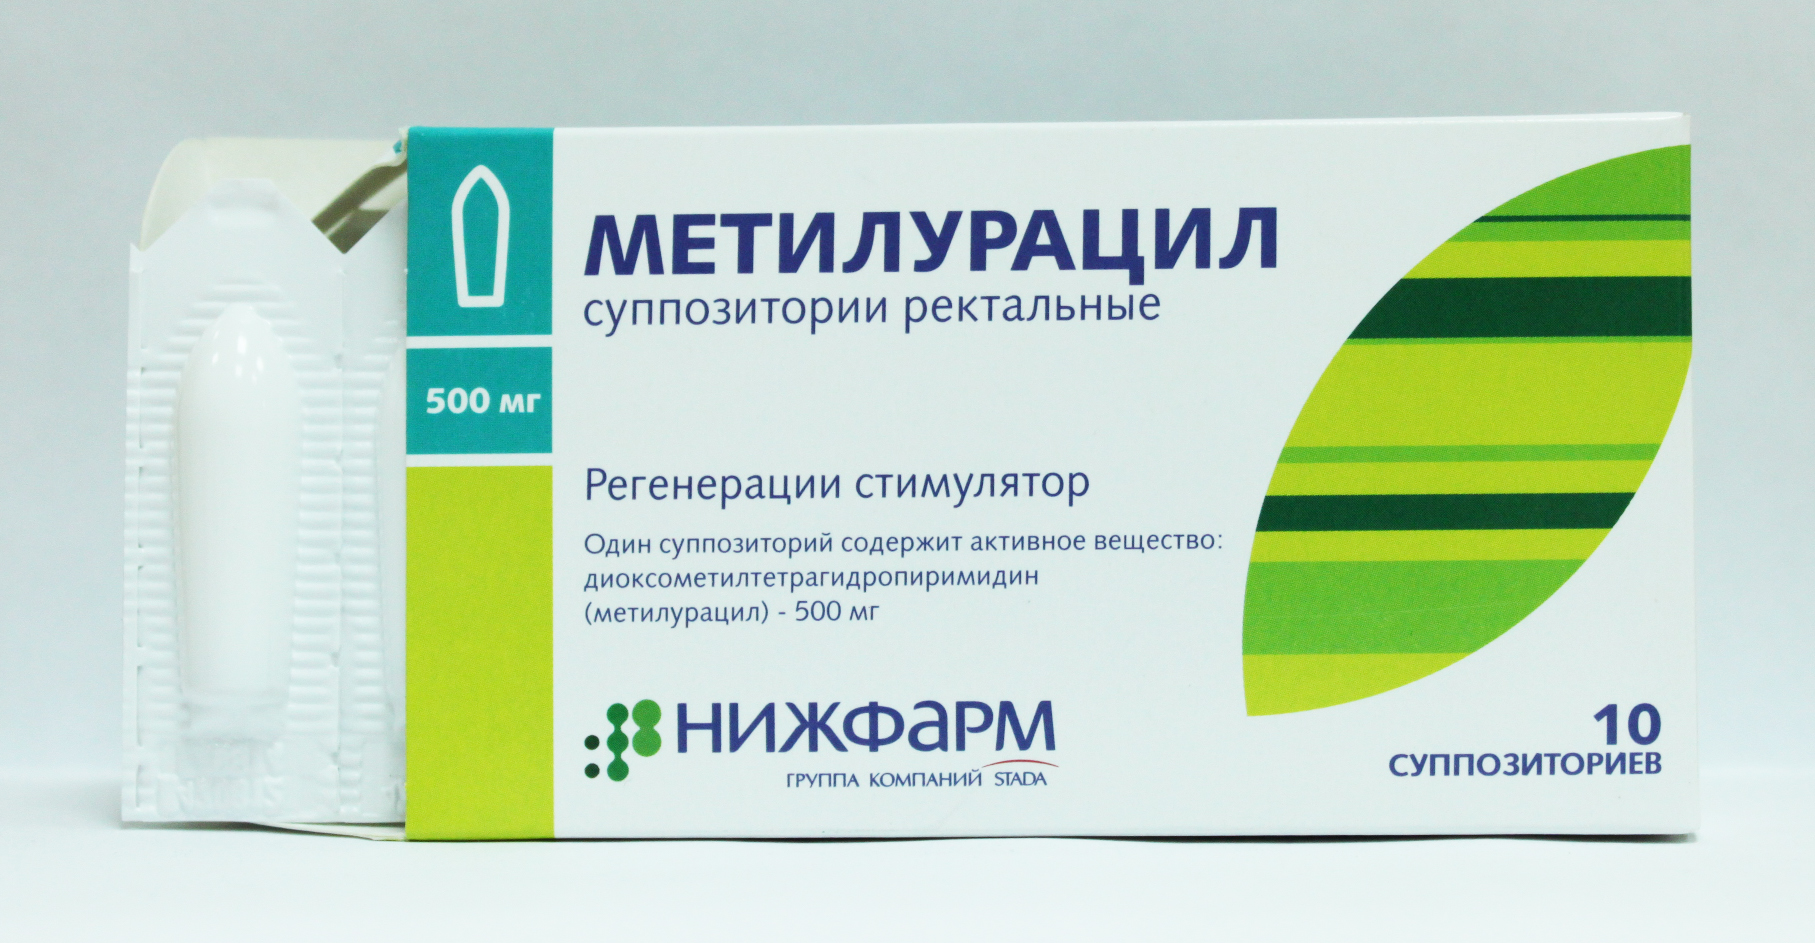 Свечи метилурацил помогают при геморрое